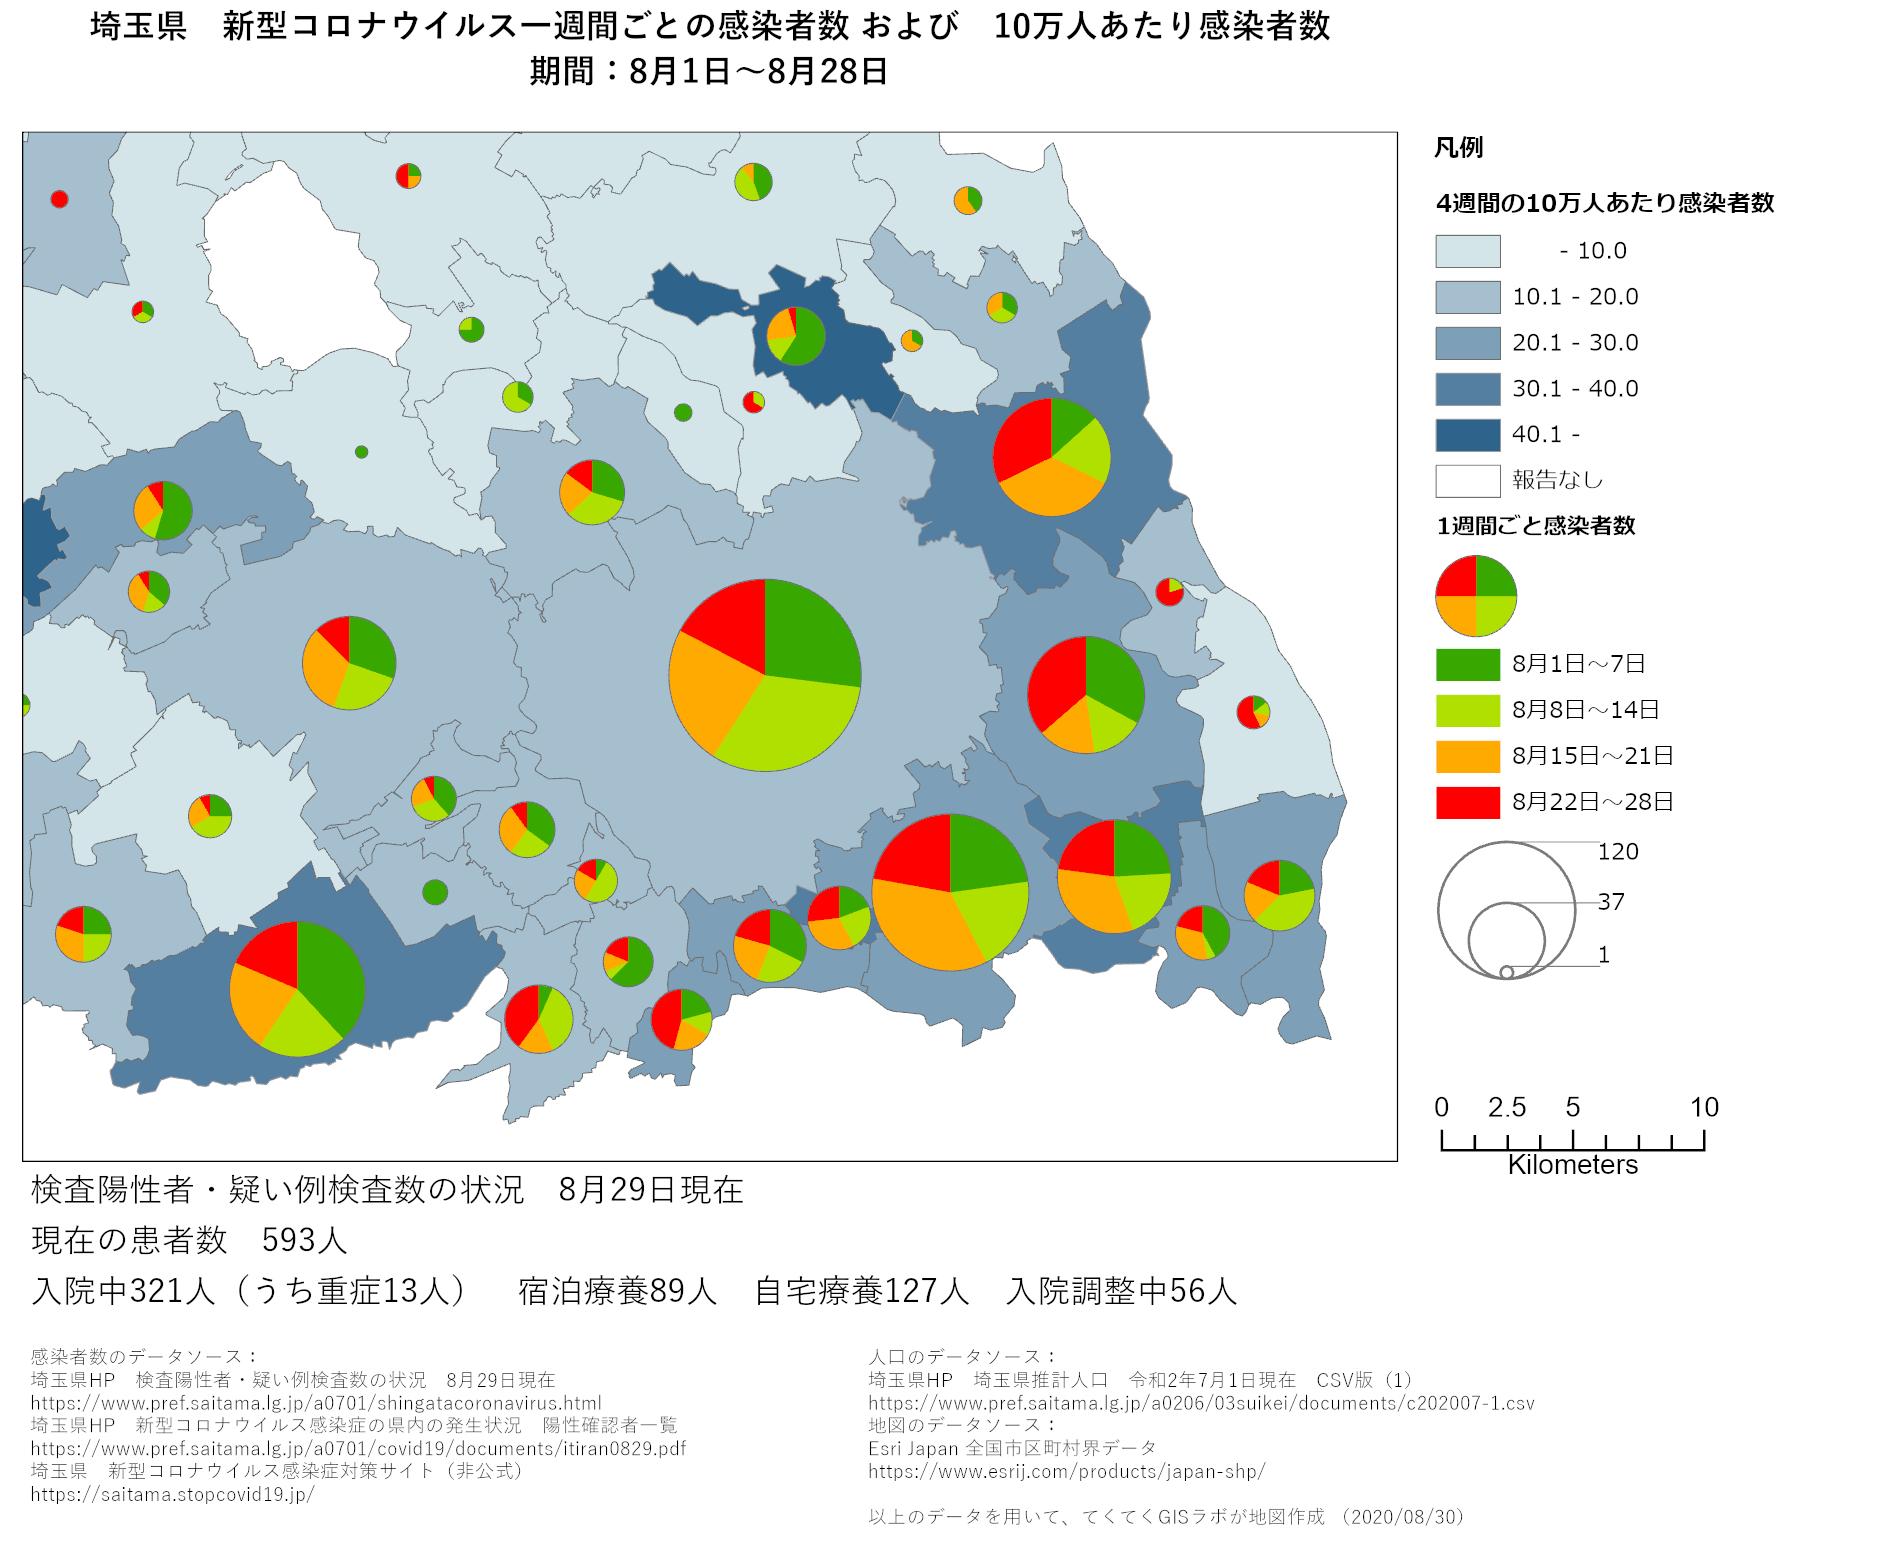 1週間ごと感染者数、埼玉県、8月1日〜28日